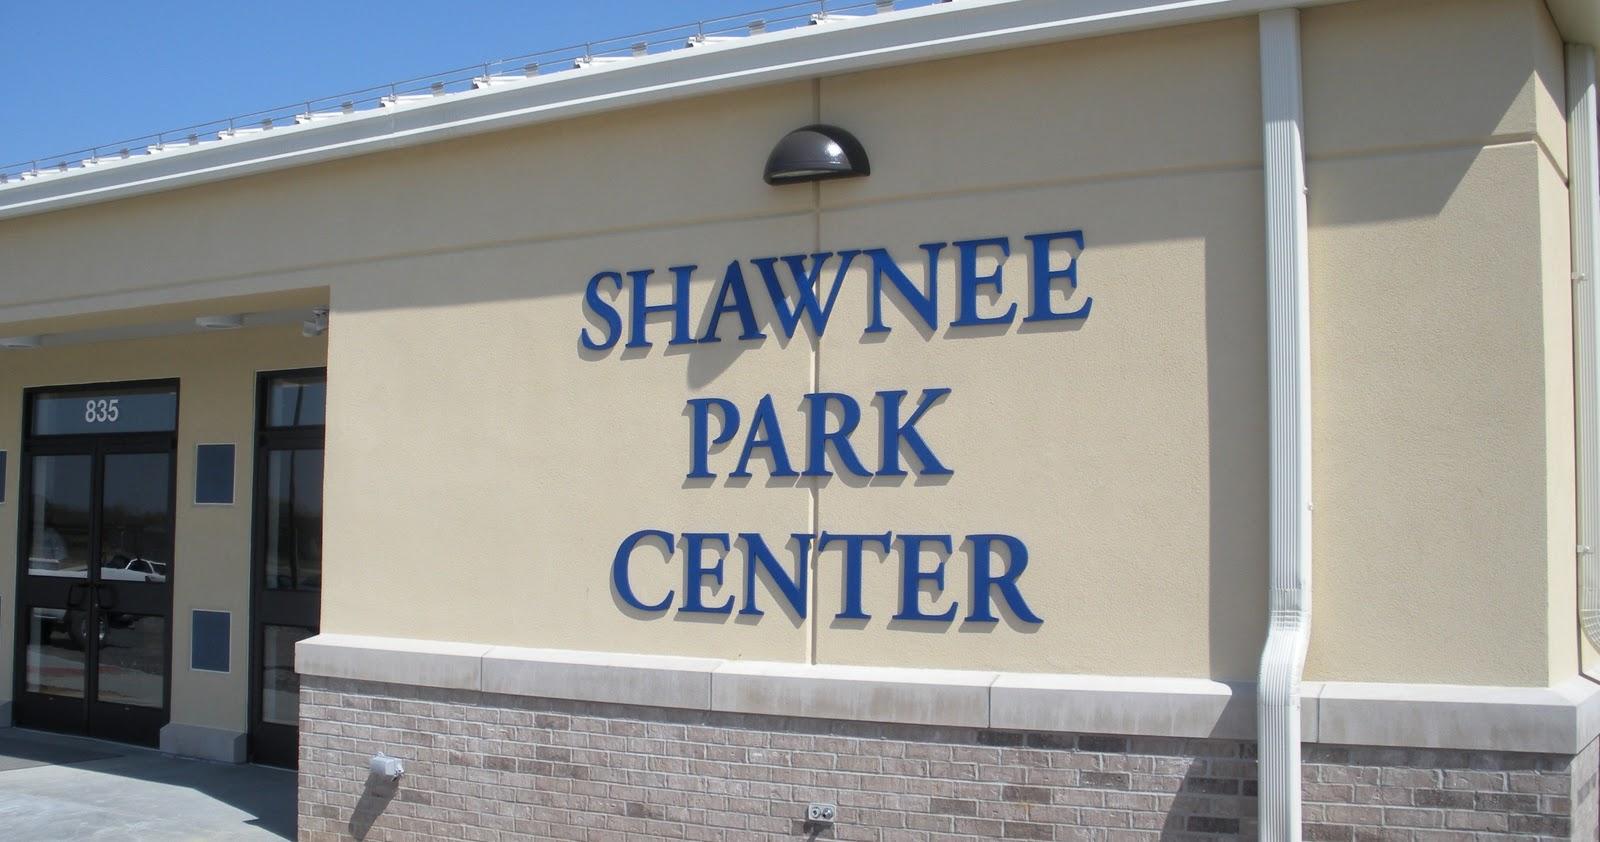 Cape Girardeau opens new community center ~ KRCU News